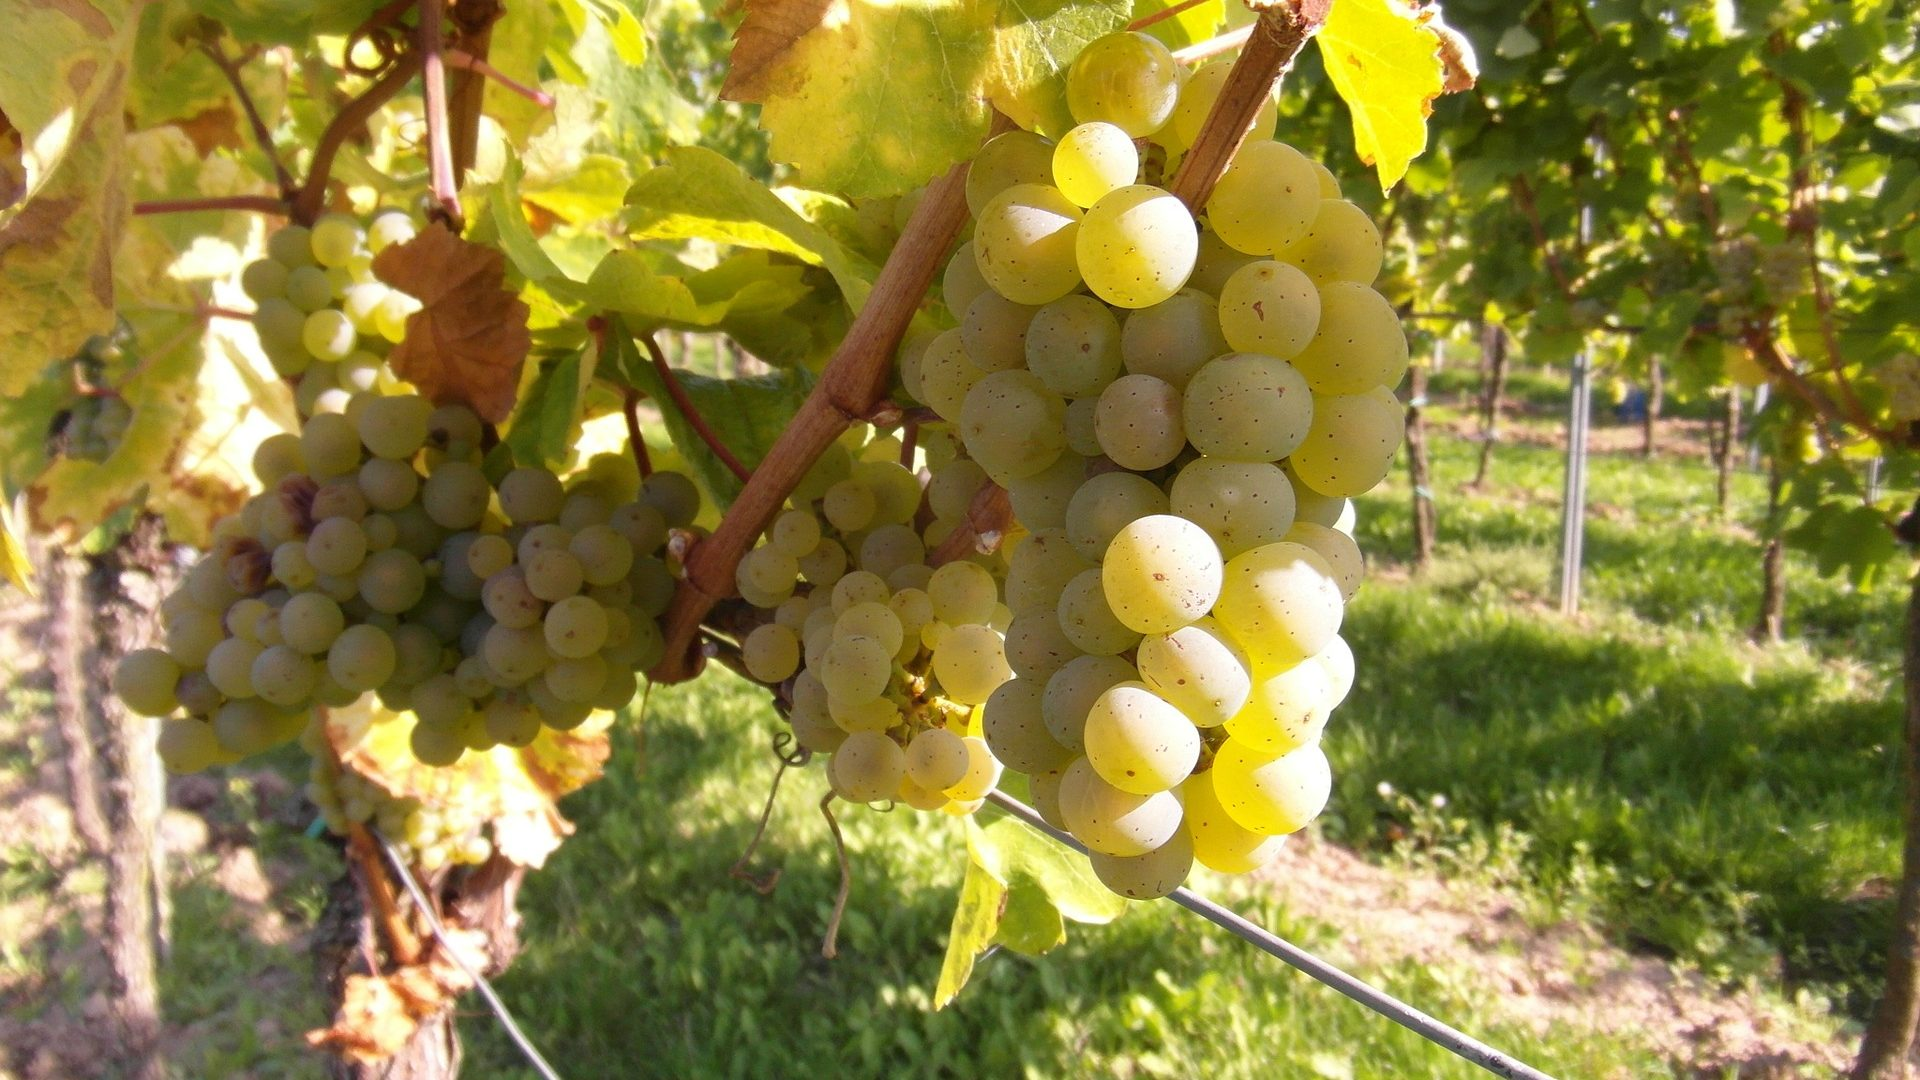 grapes-259862_1920